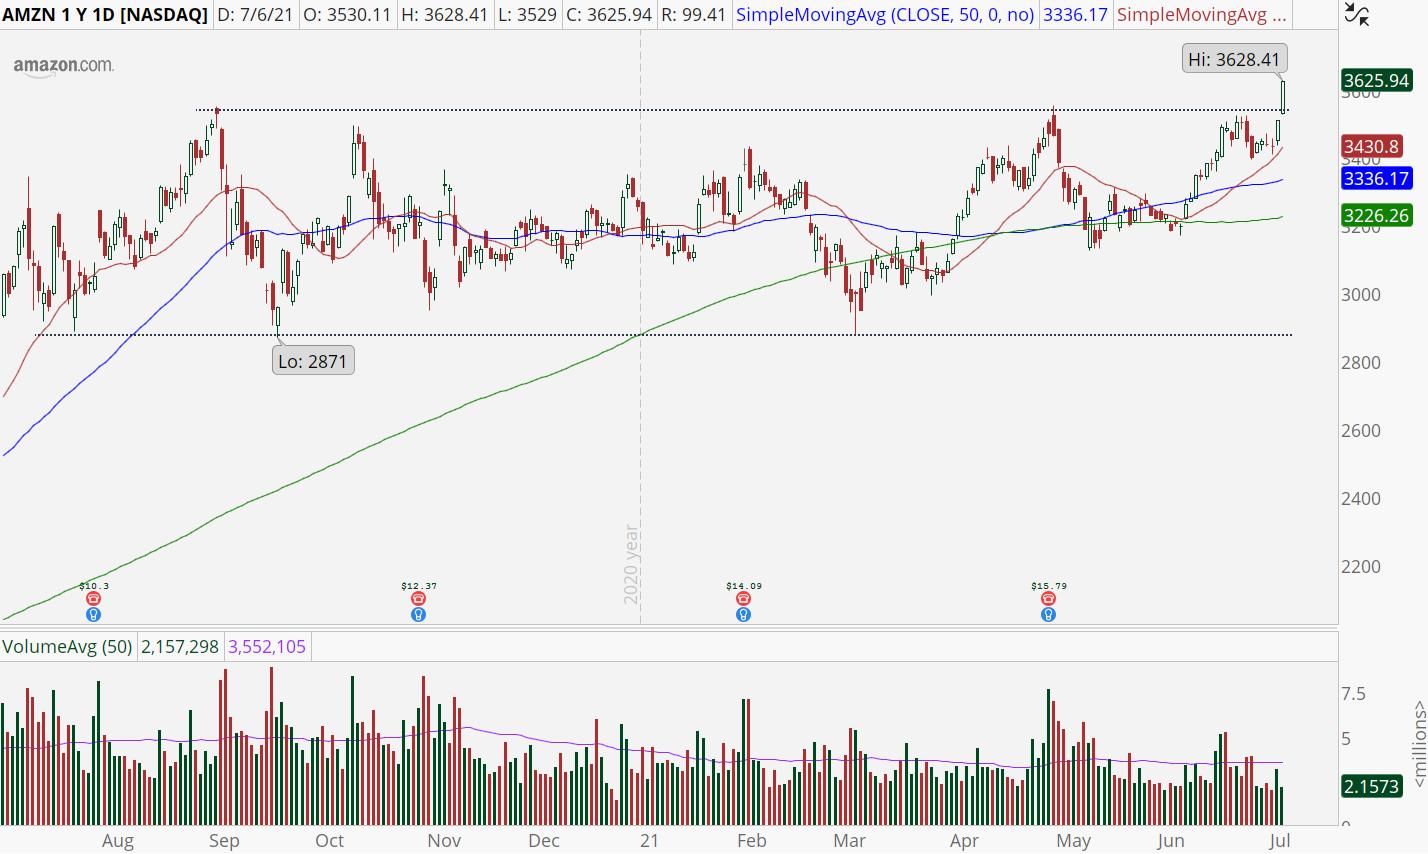 Amazon (AMZN) stock with bullish breakout